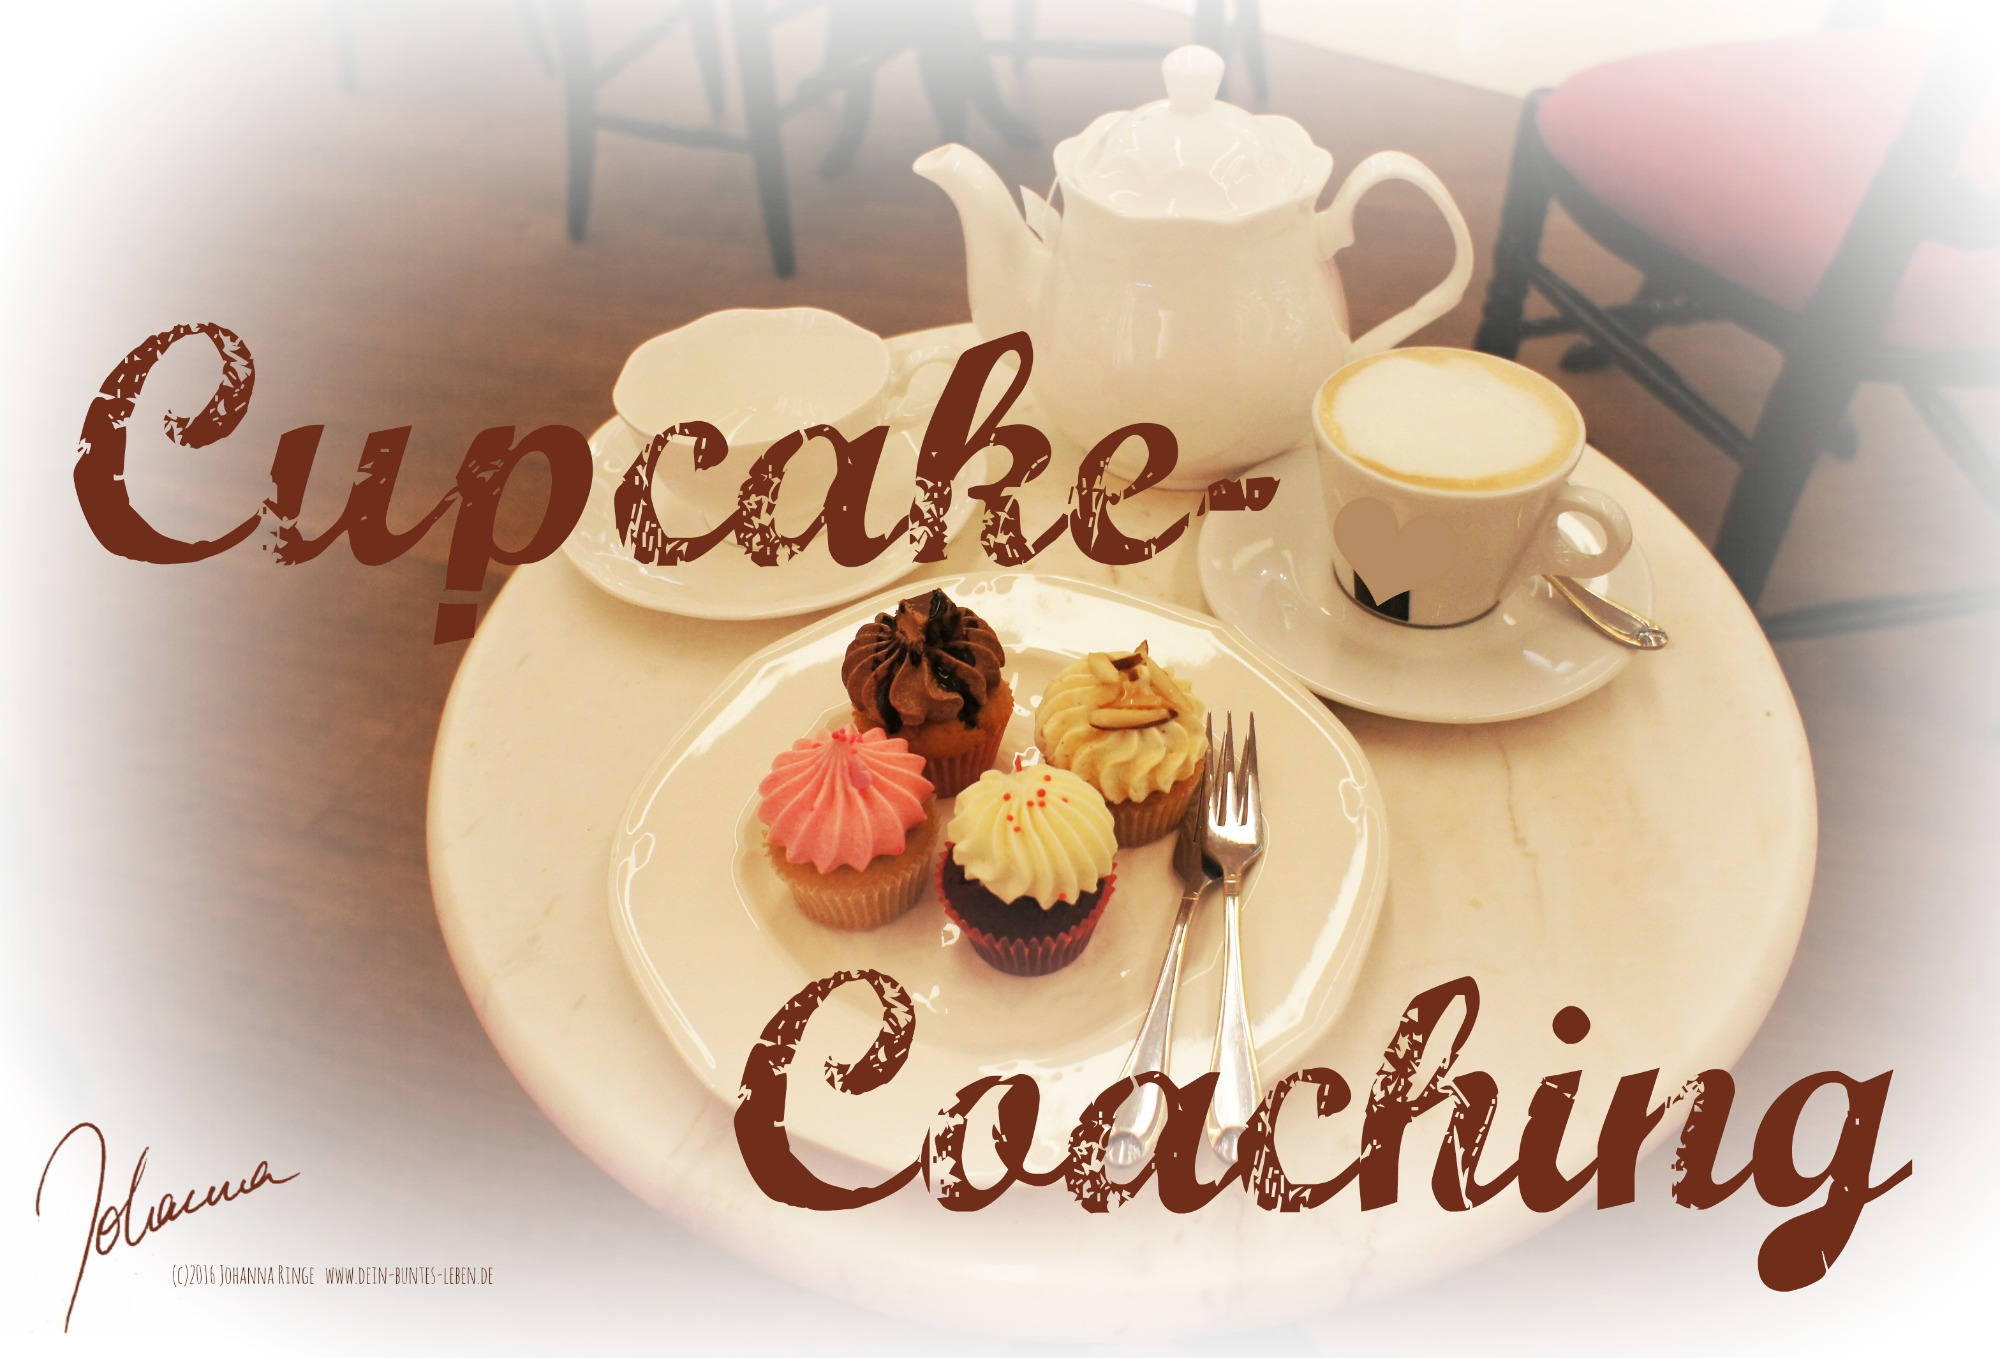 Cupcake-Coaching (c)2016 Johanna Ringe www.dein-buntes-leben.de http://coach-n.coffee